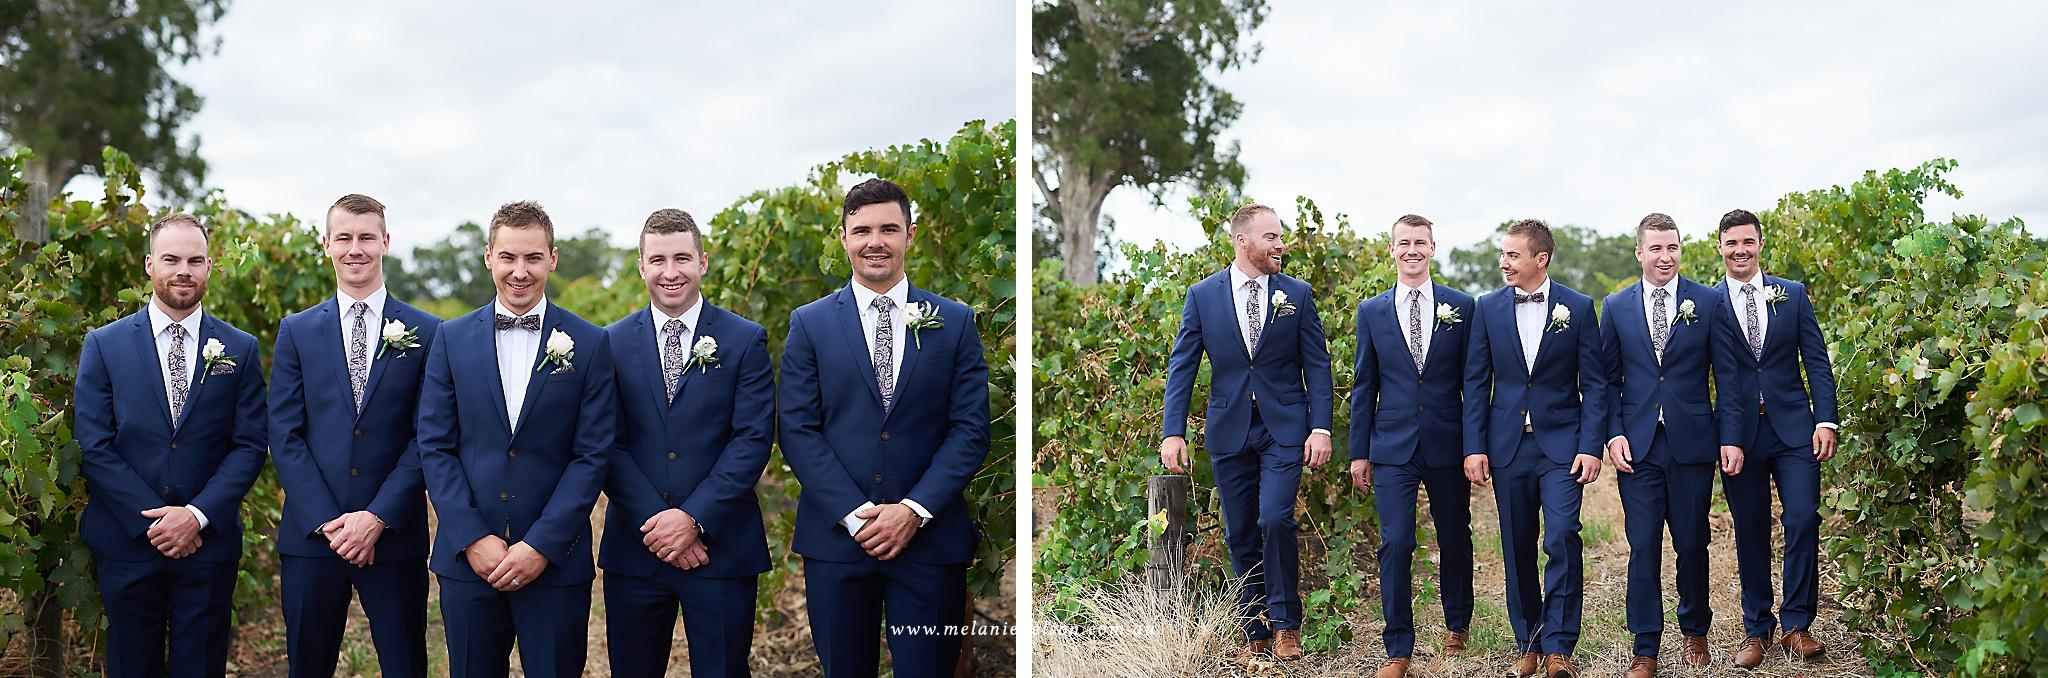 serafino_wedding_photography_0052.jpg